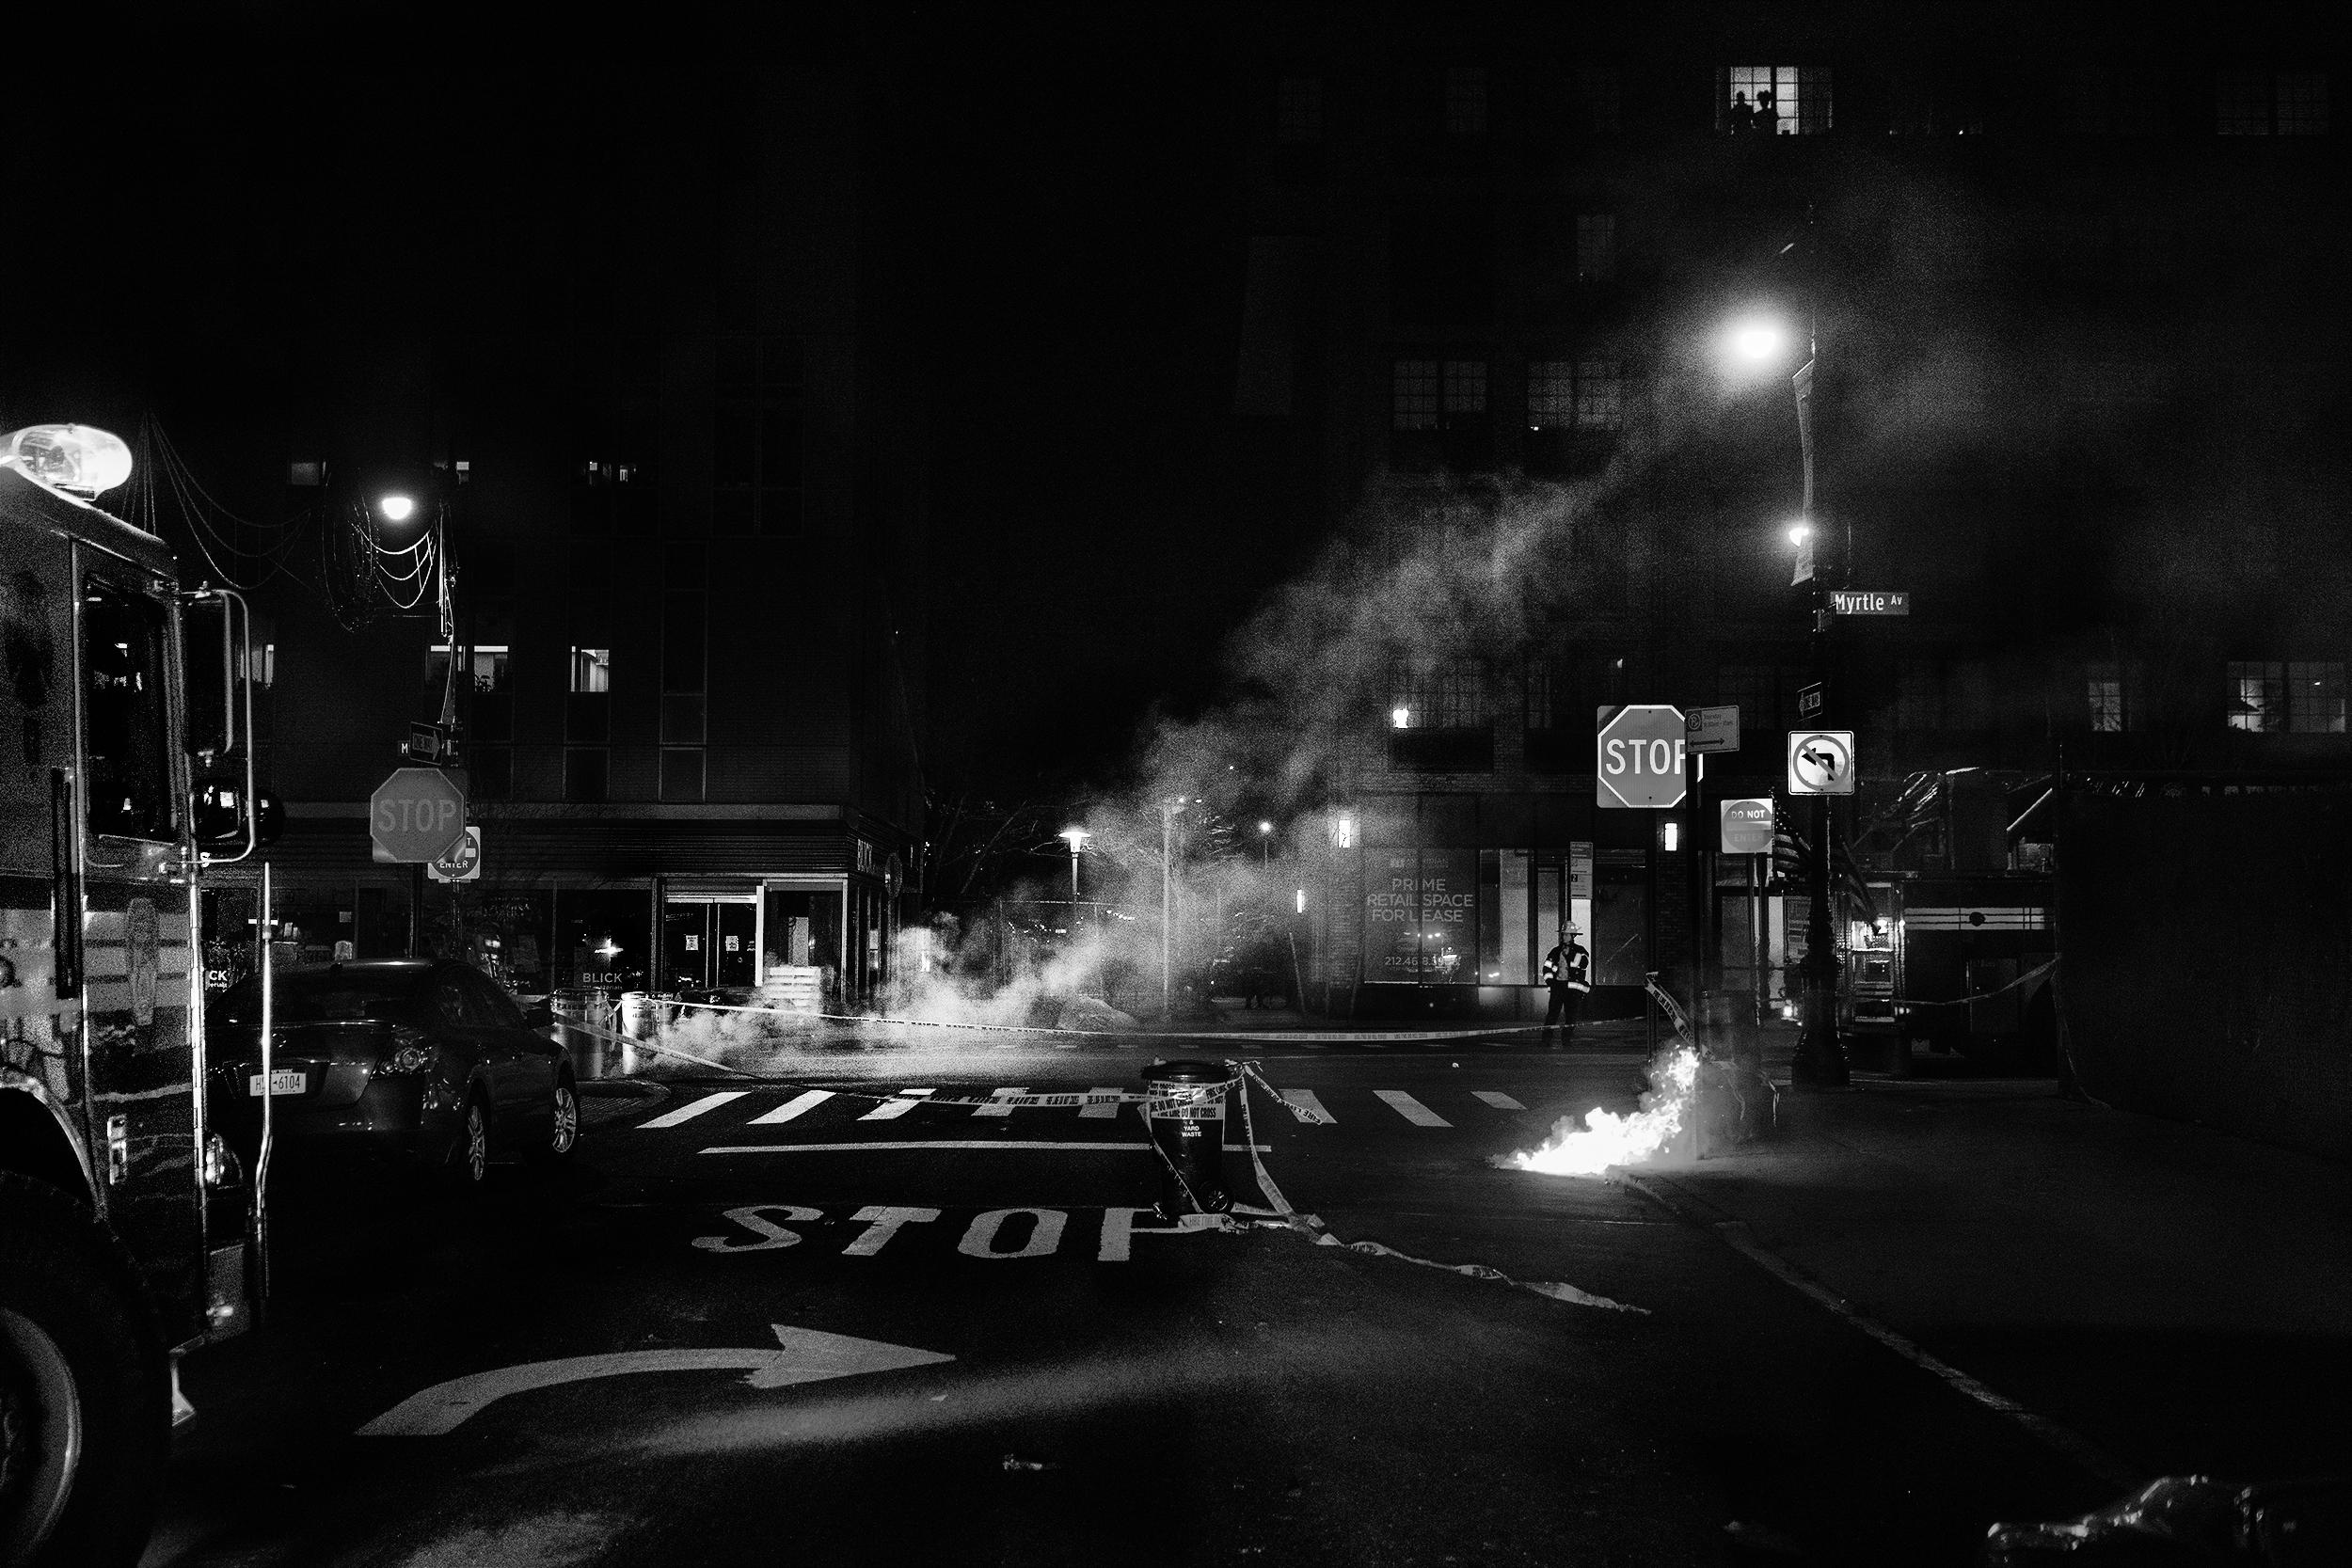 Brklyn_Street_Manhole_Fire-033crp.jpg